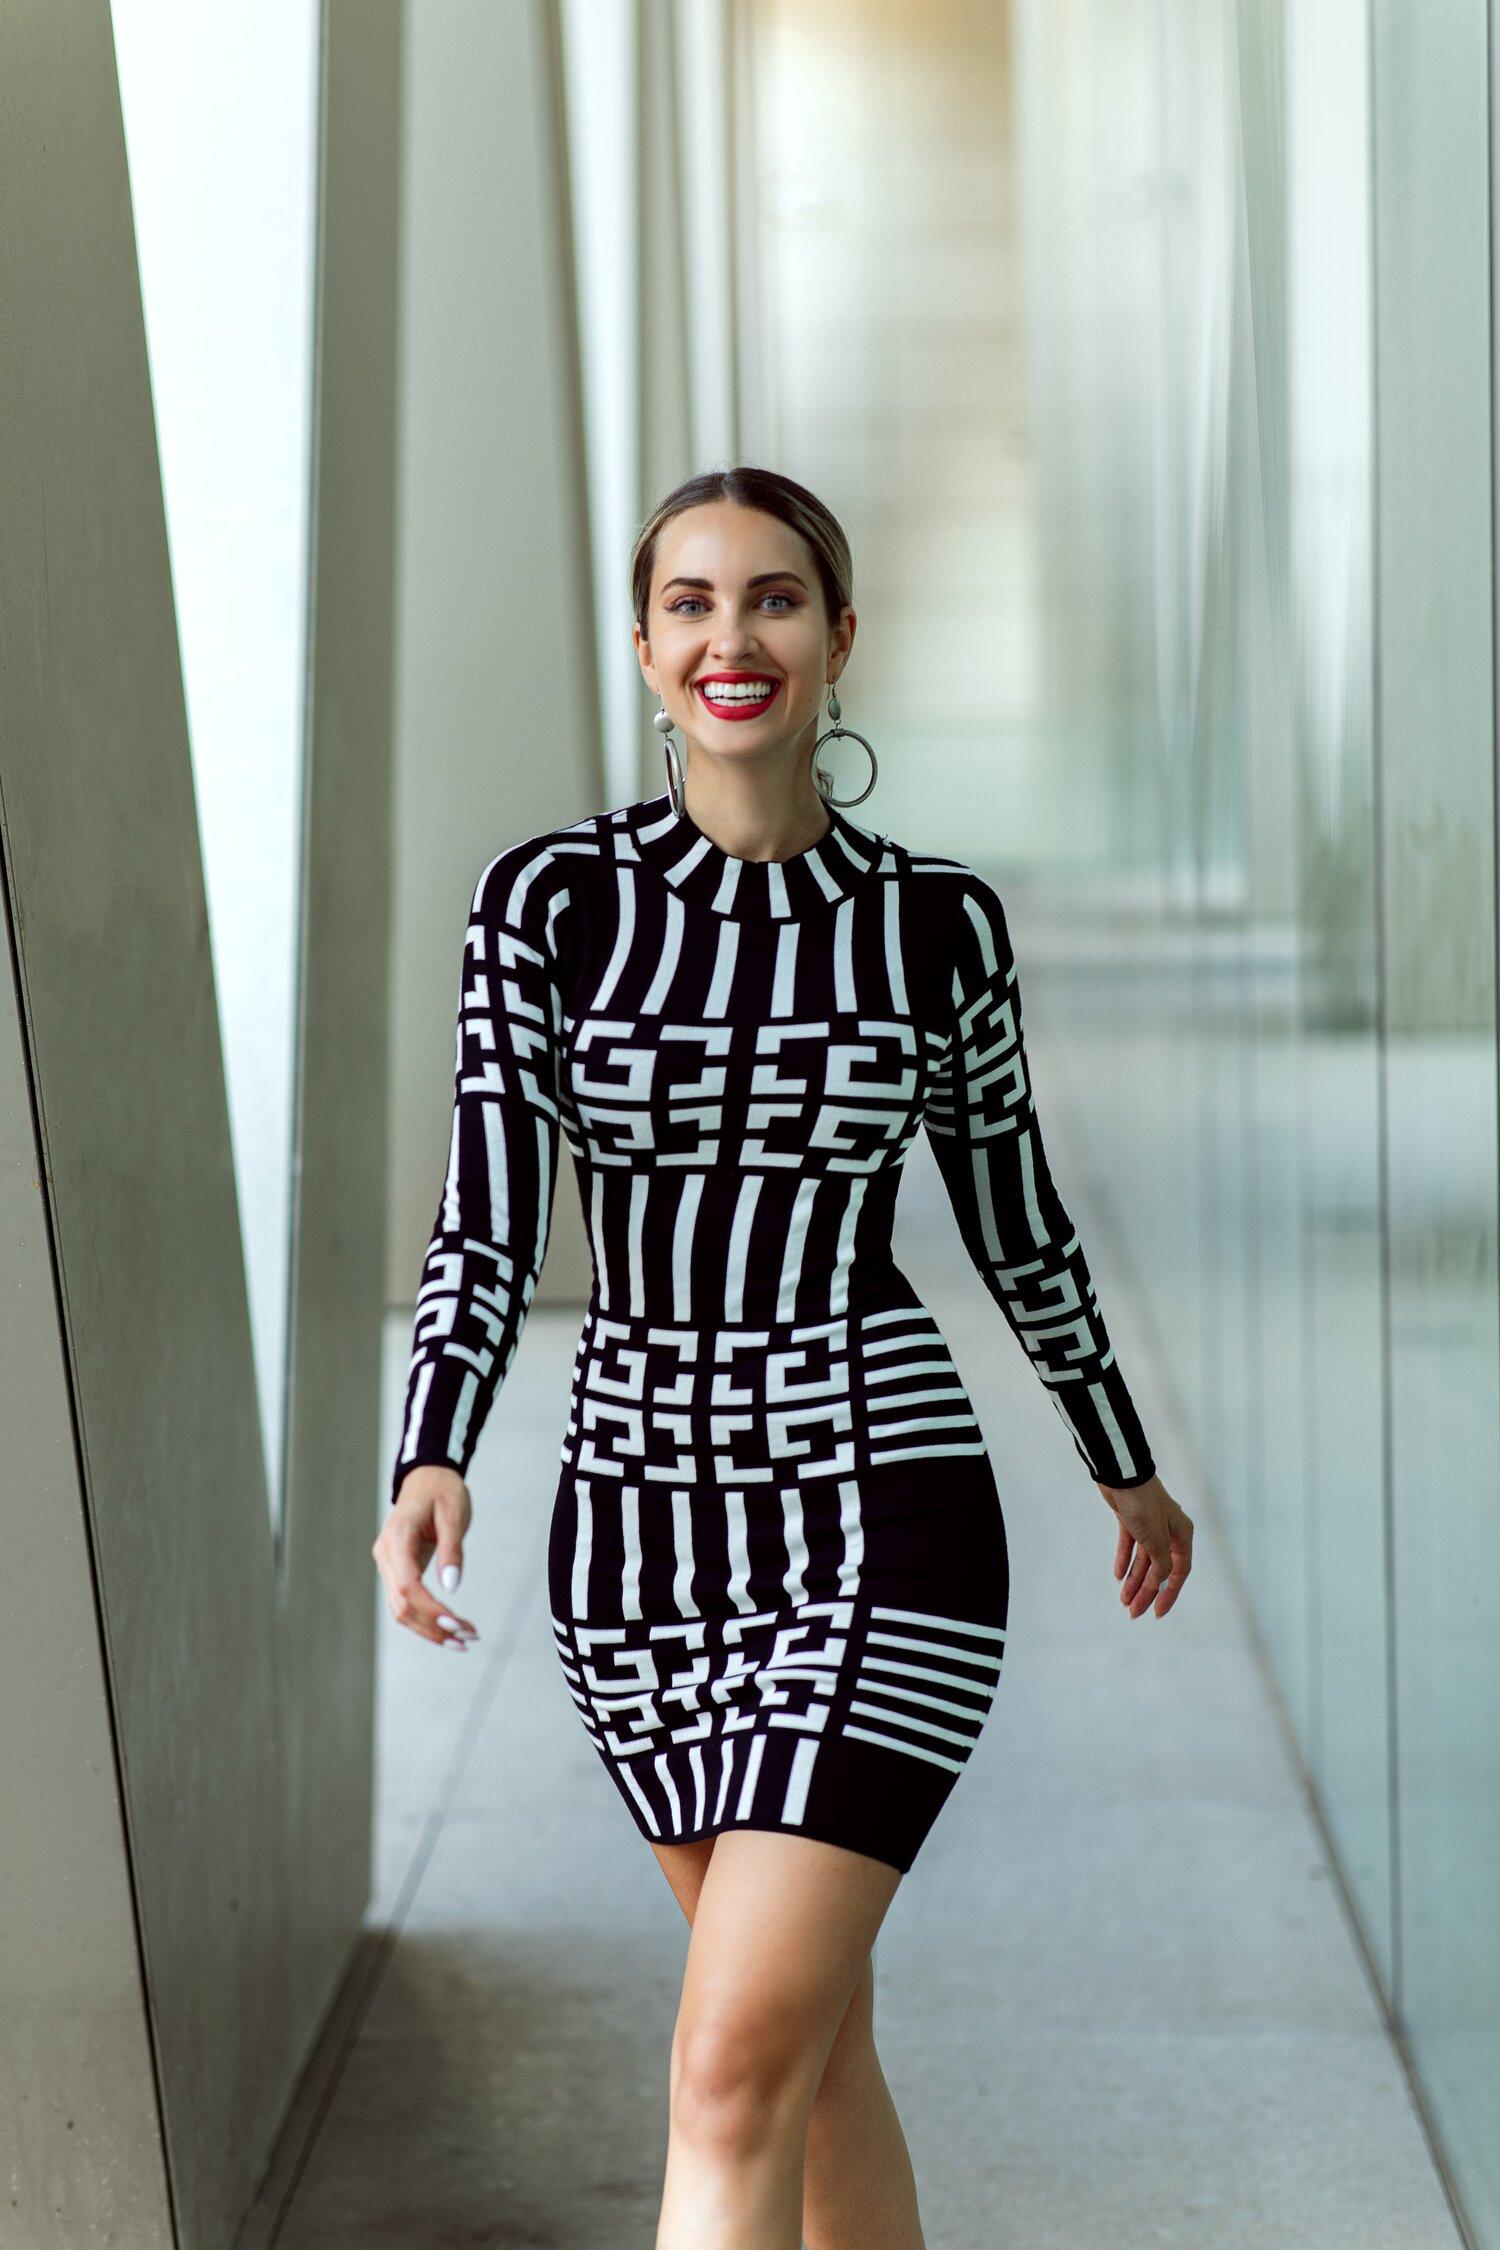 Rochie Reily neagra cu imprimeu labirint alb